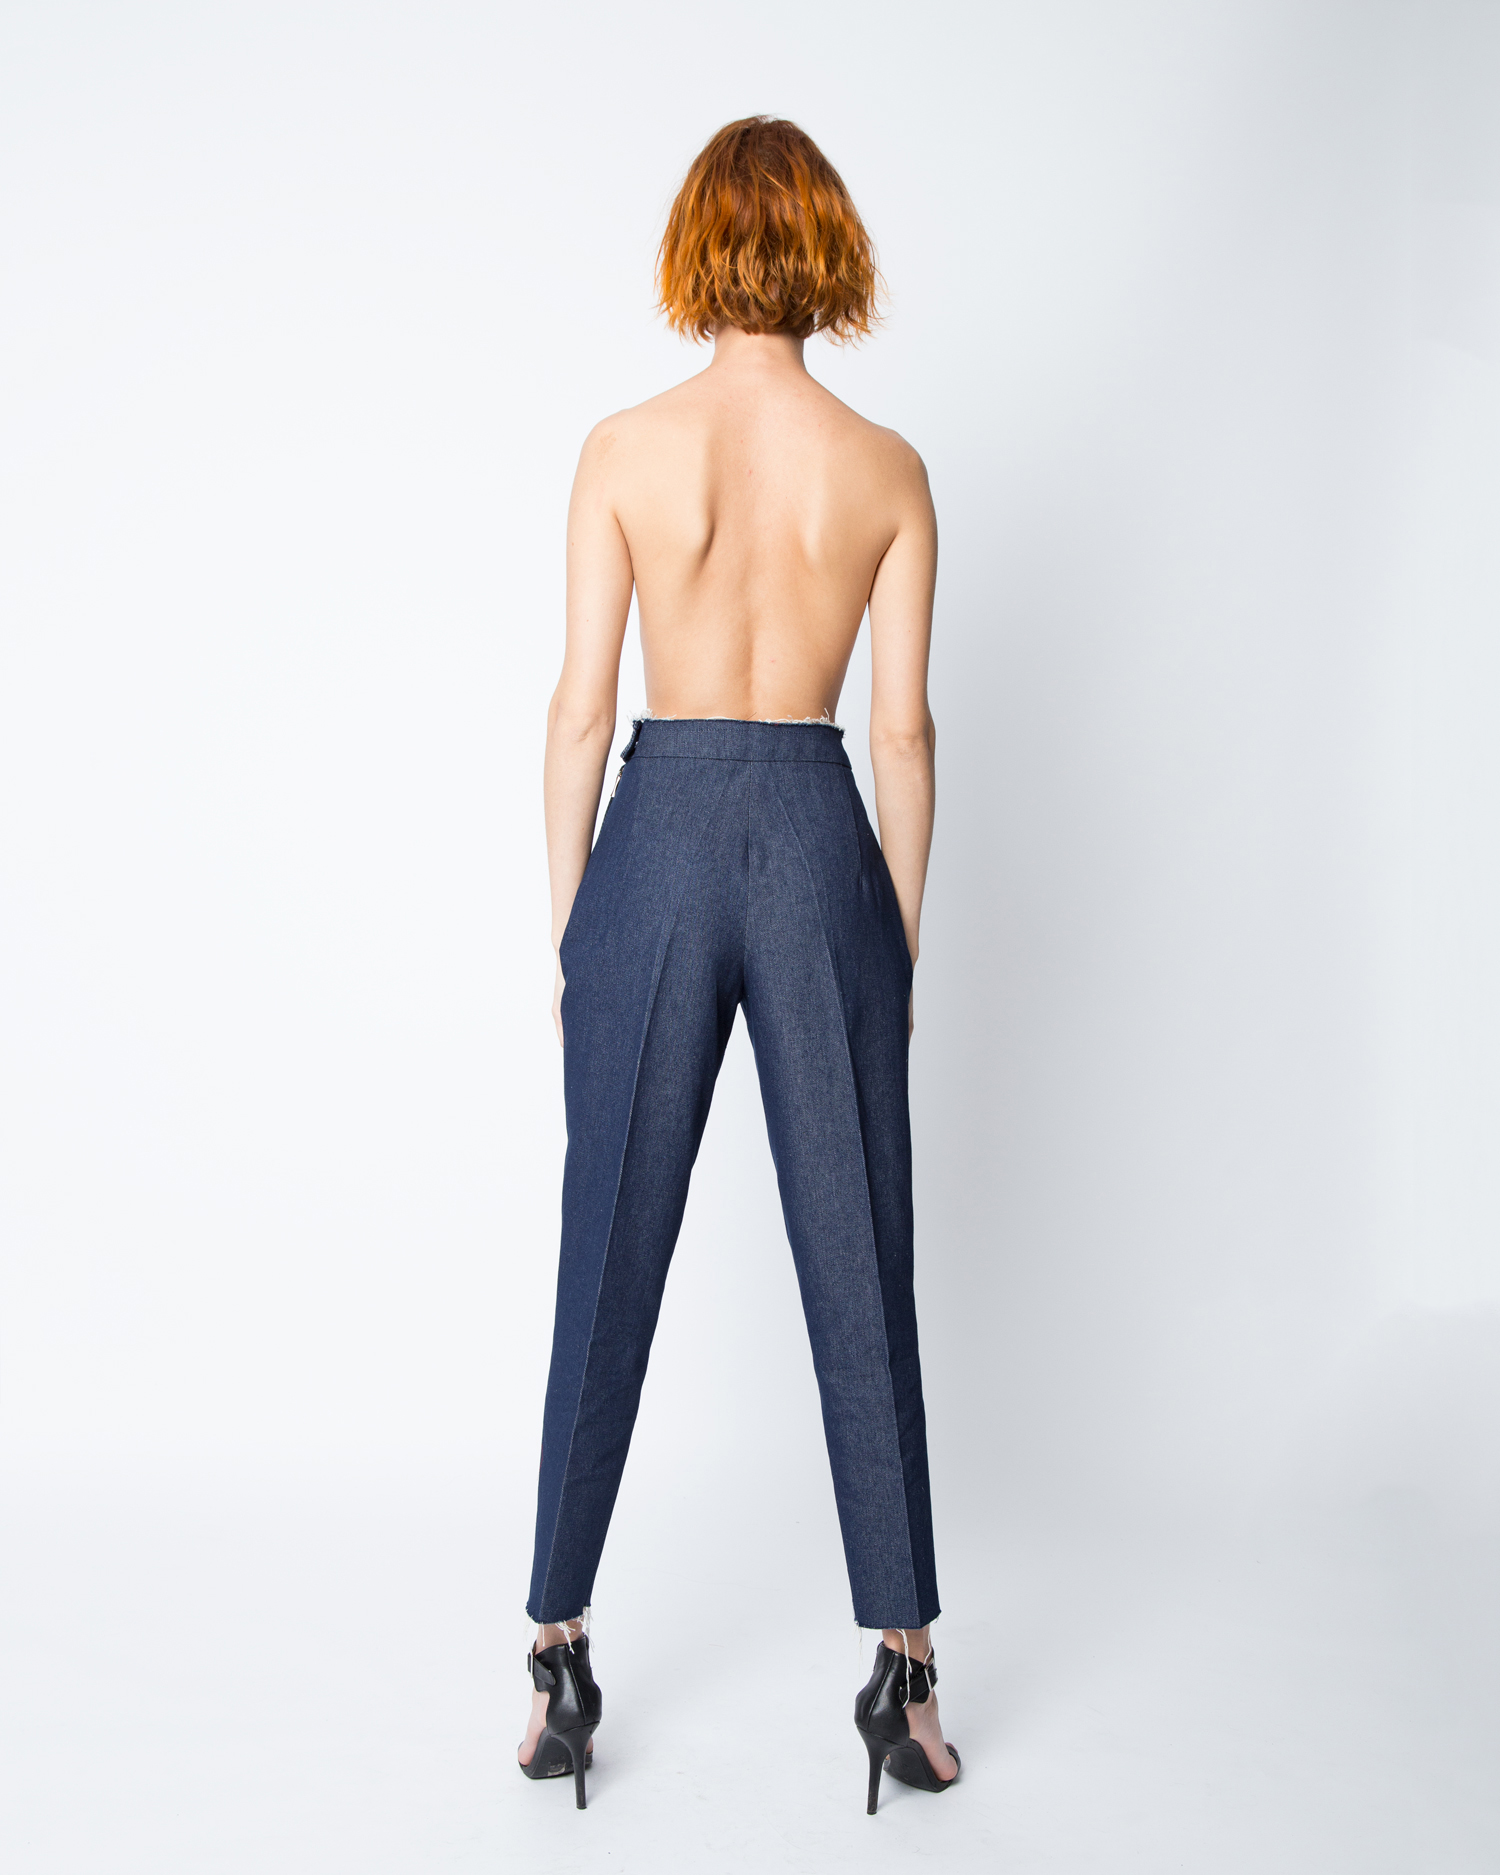 olya-kosterina-ss18-classic-denim-trousers-03.jpg